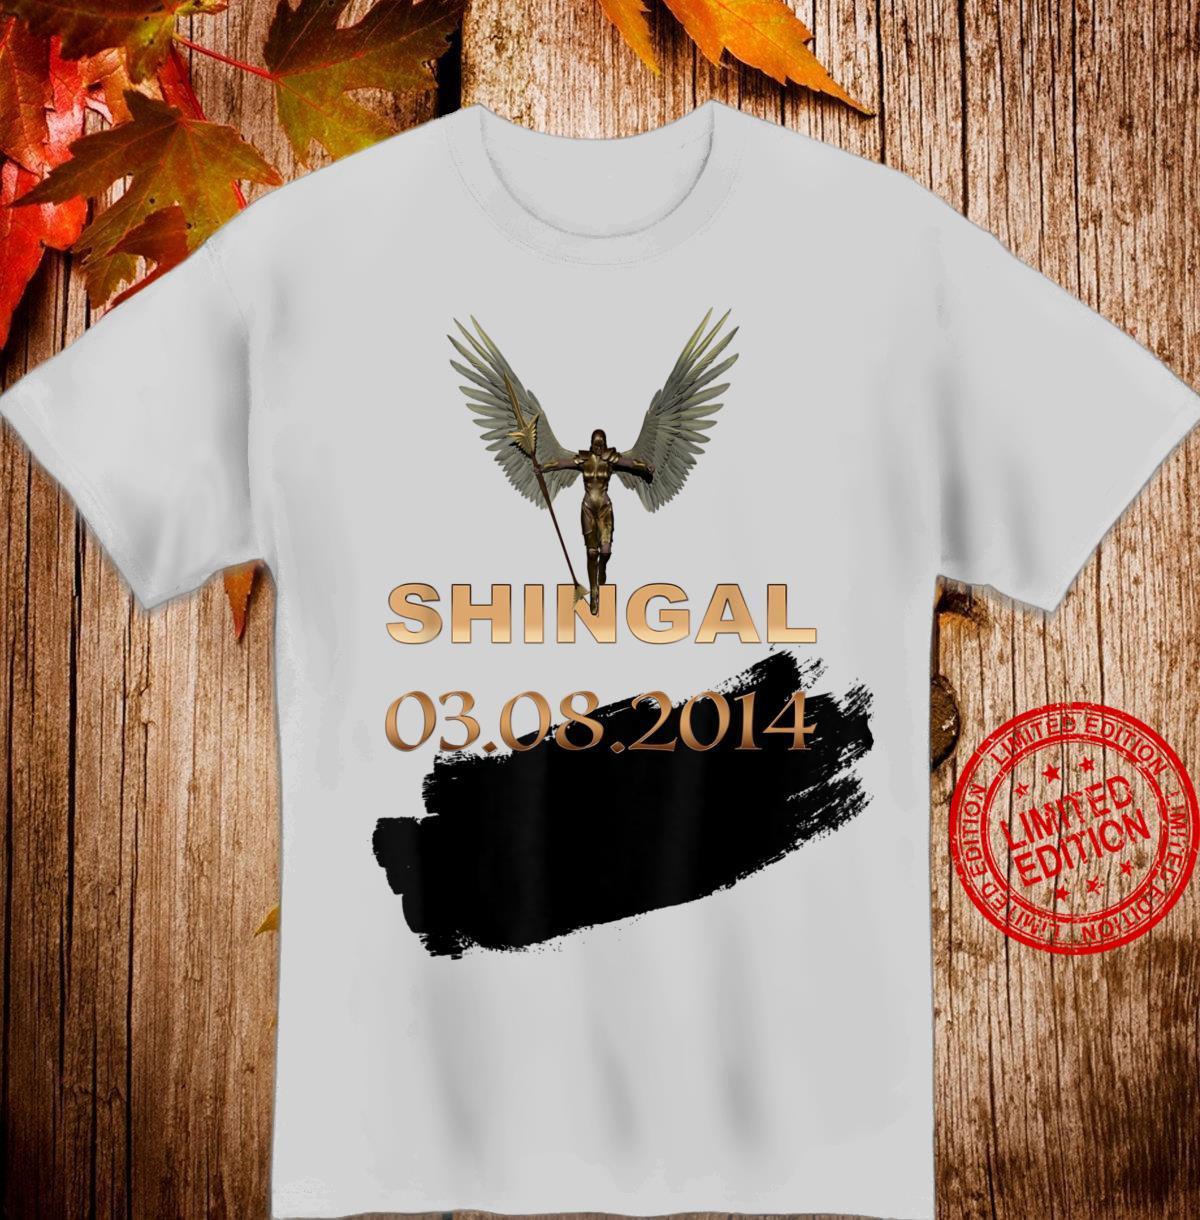 Shingal 03.08.2014 Shirt